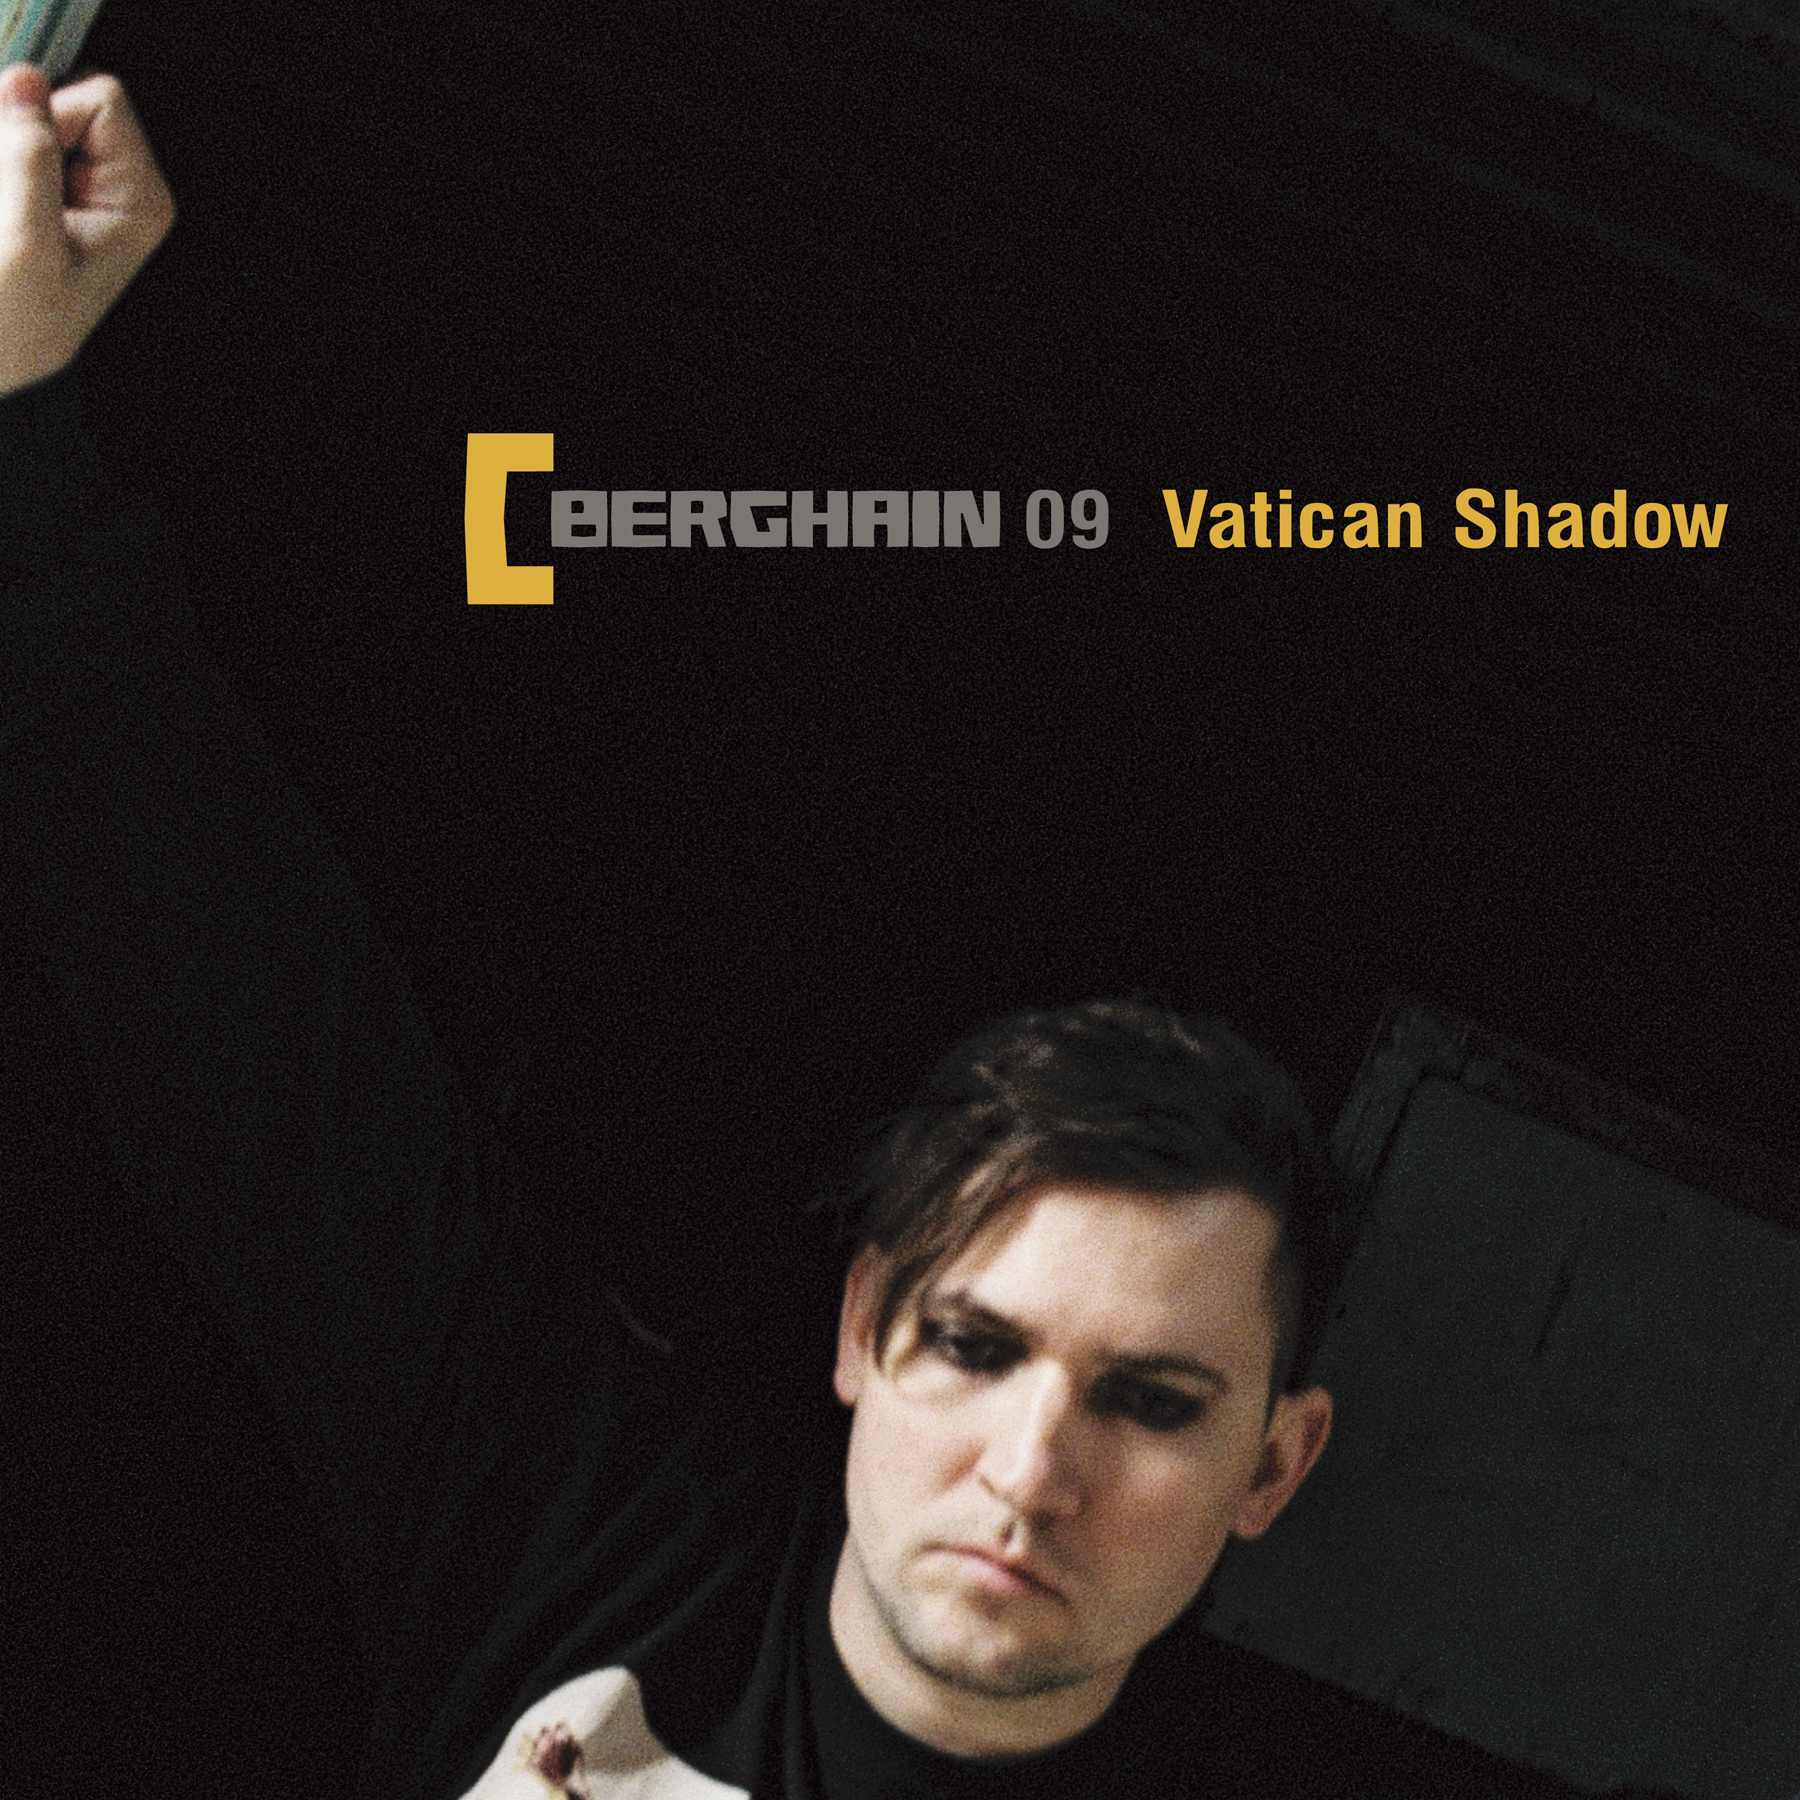 Vatican Shadow to helm next instalment of Berghain mix series